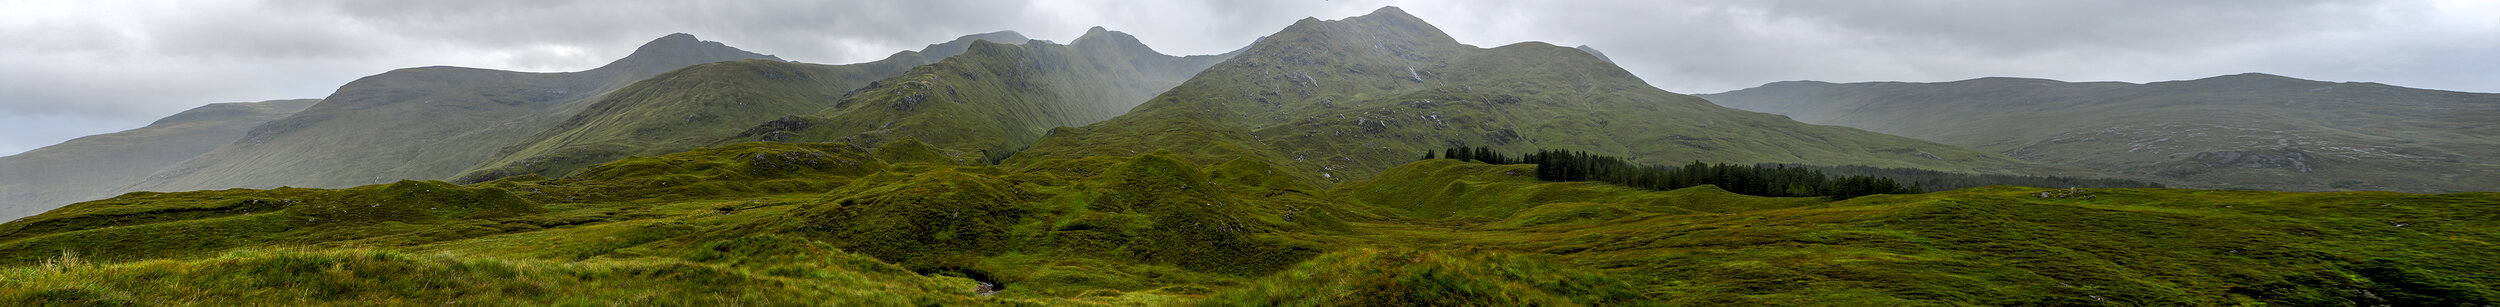 scotland pano small.jpg